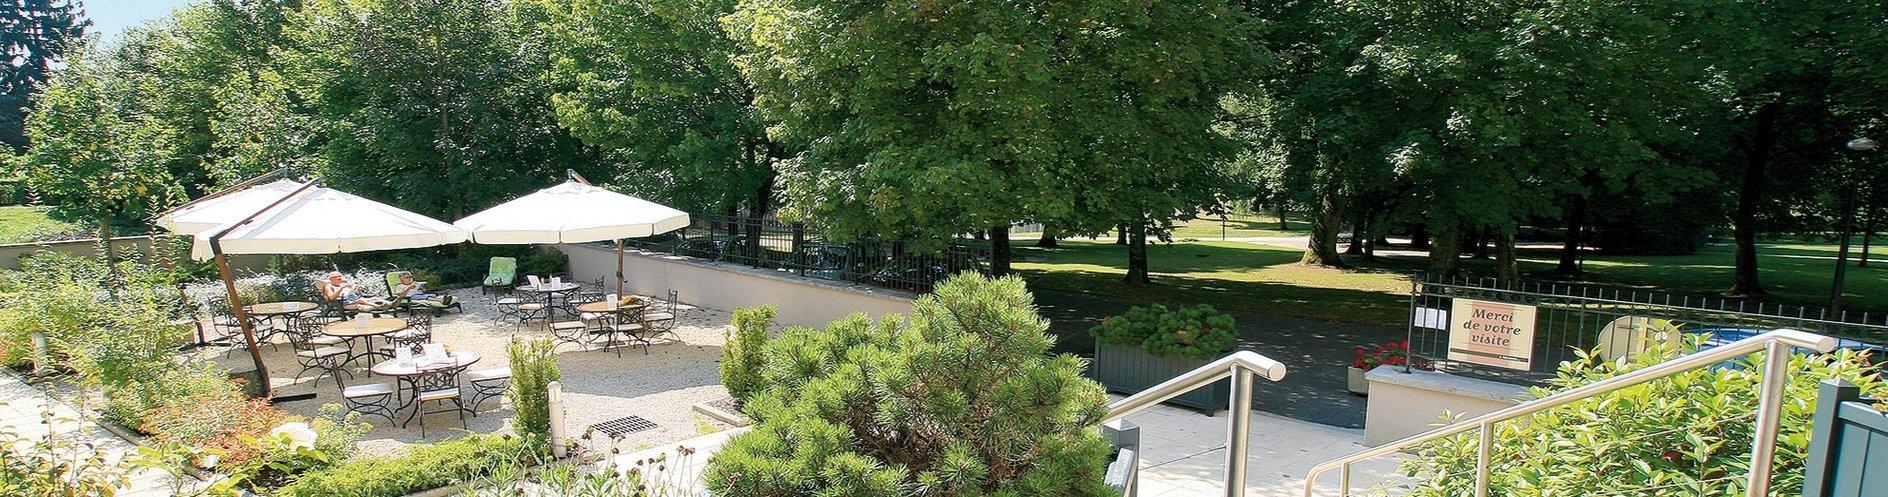 cerise-luxeuil-les-sources-hotel-residence-terrasse-jardinl.jpg